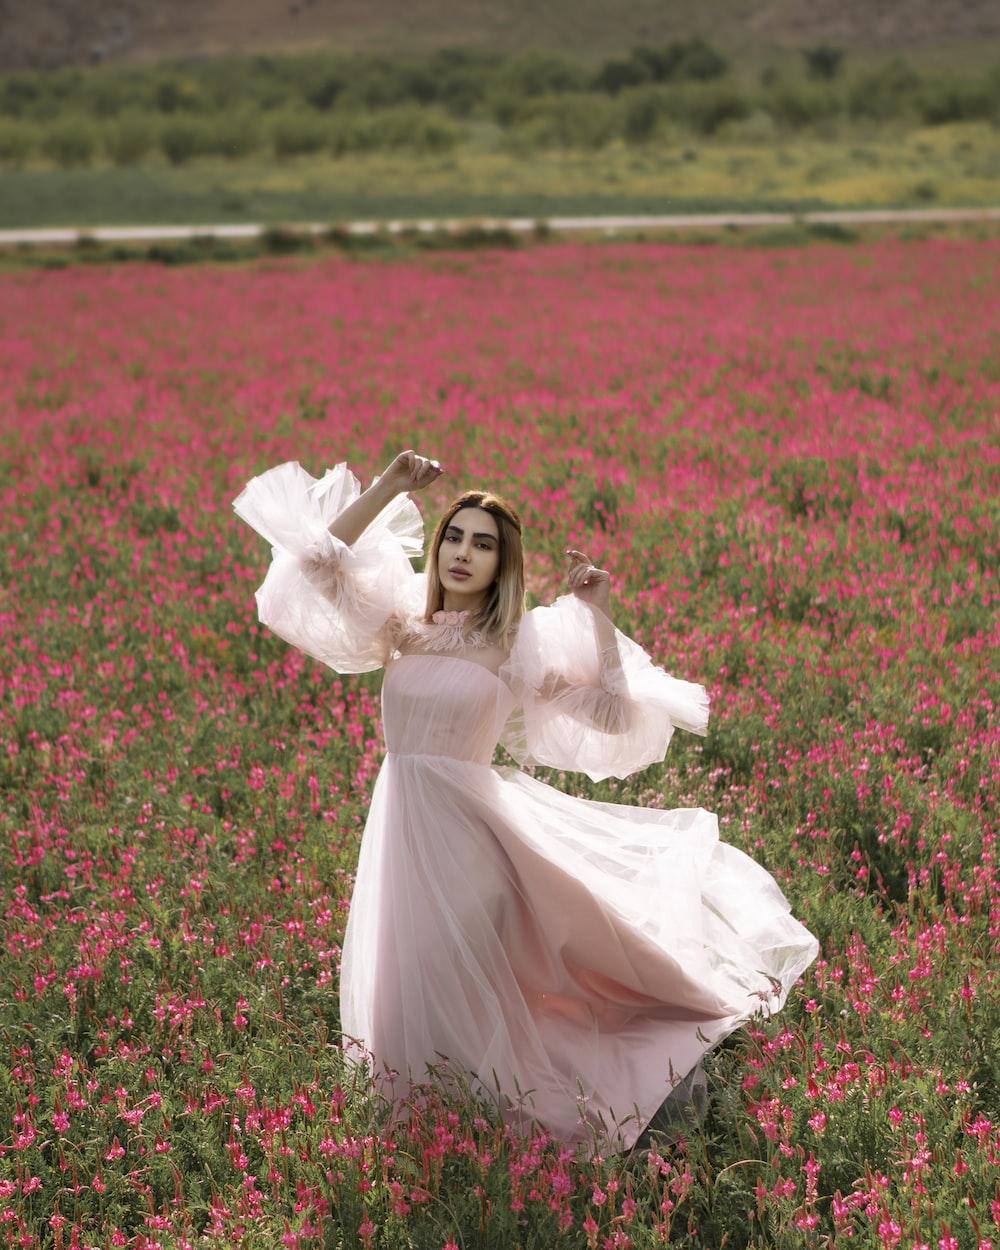 girl in white dress lying on red flower field during daytime